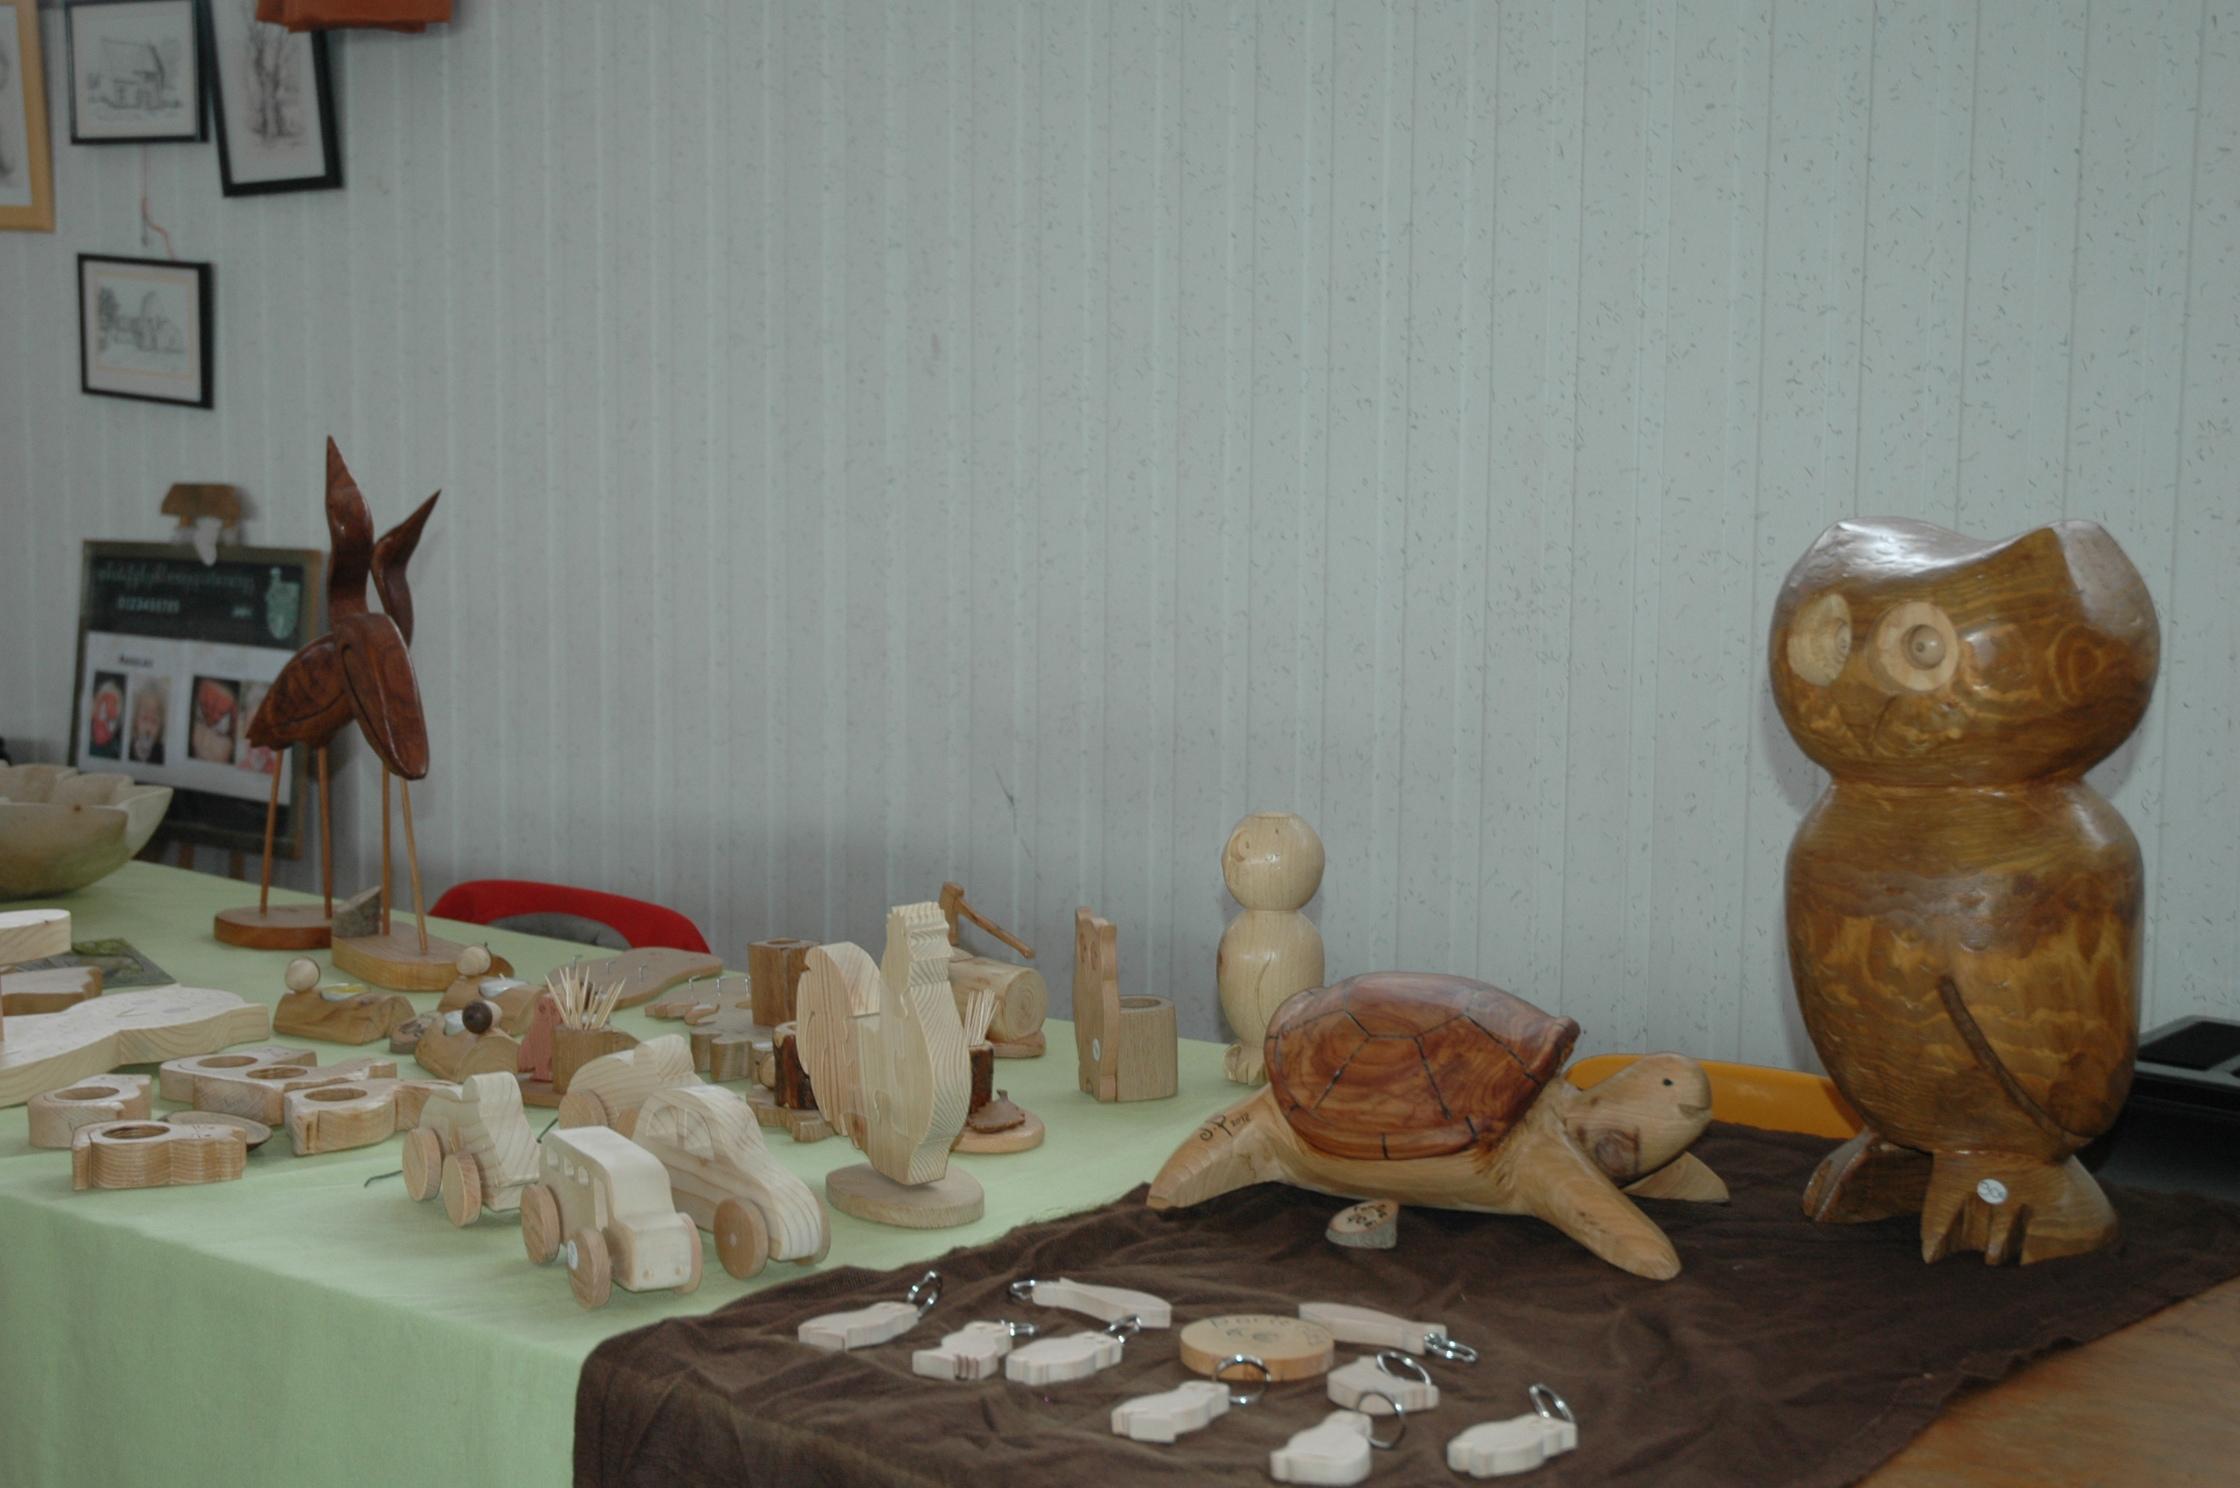 Chene Bois Cerilly : brocante artisanale allier cher Association touristique – Centre